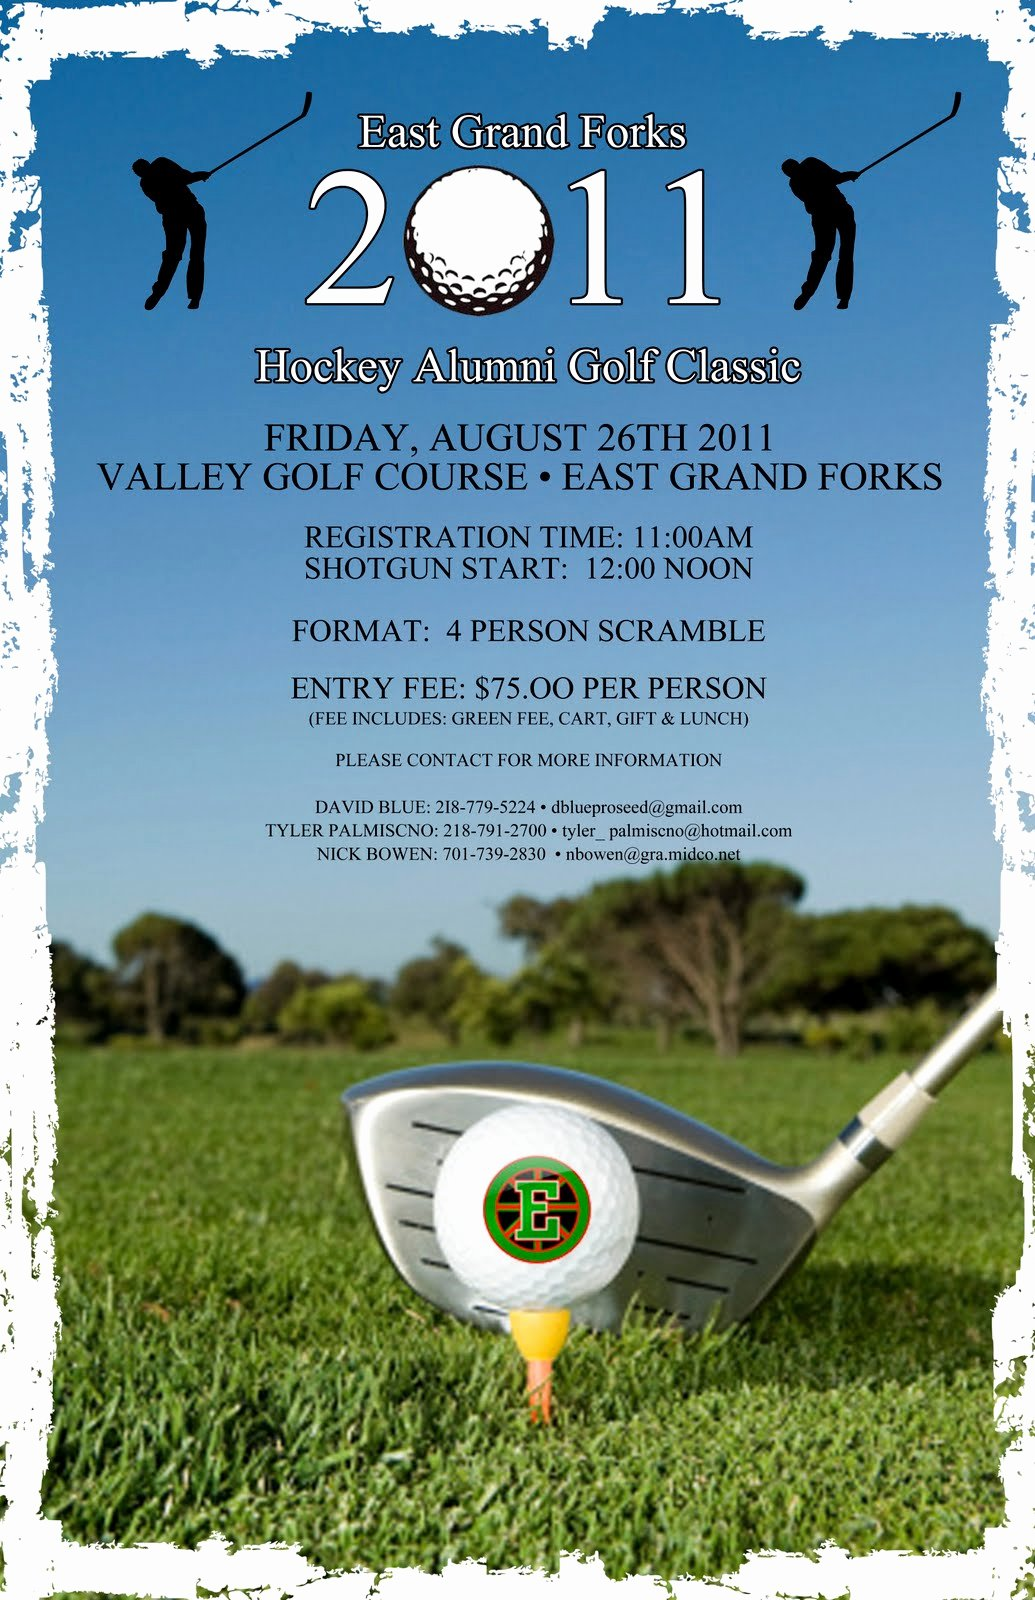 Golf tournament Flyer Template Elegant East Grand forks Greenwave Hockey Golf tournament